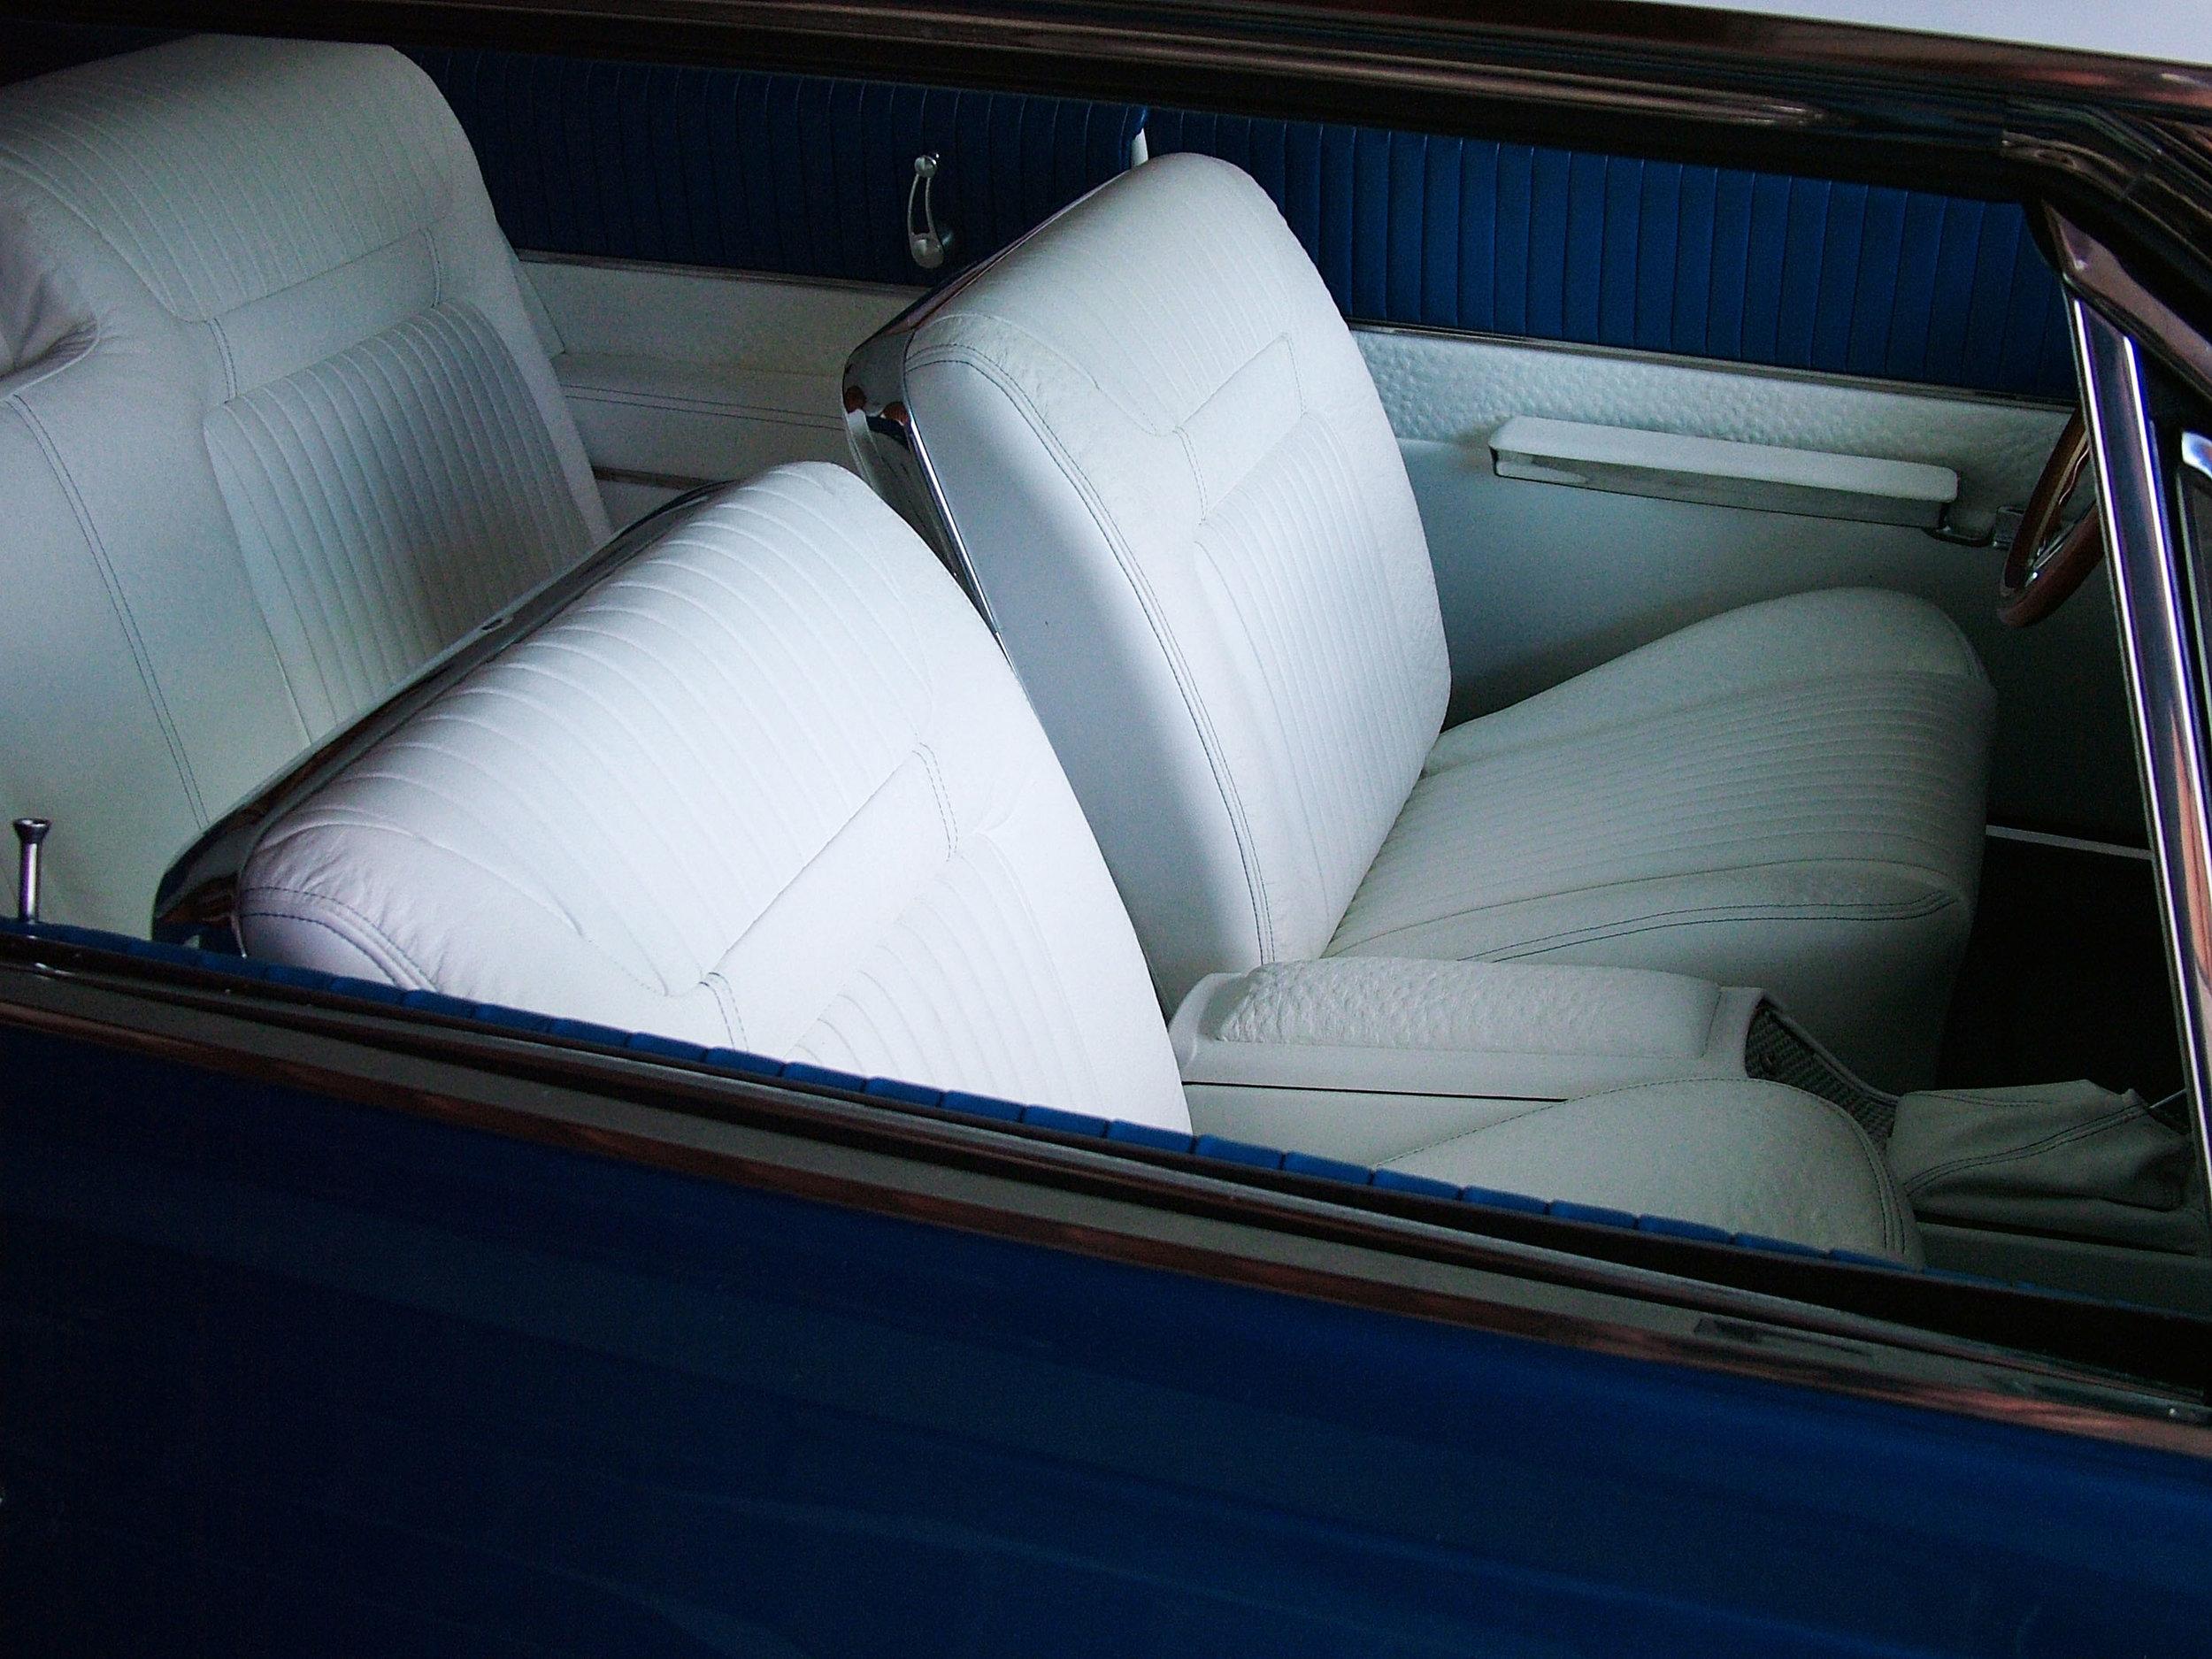 Full custom Impala interior with white leather bucket seats.